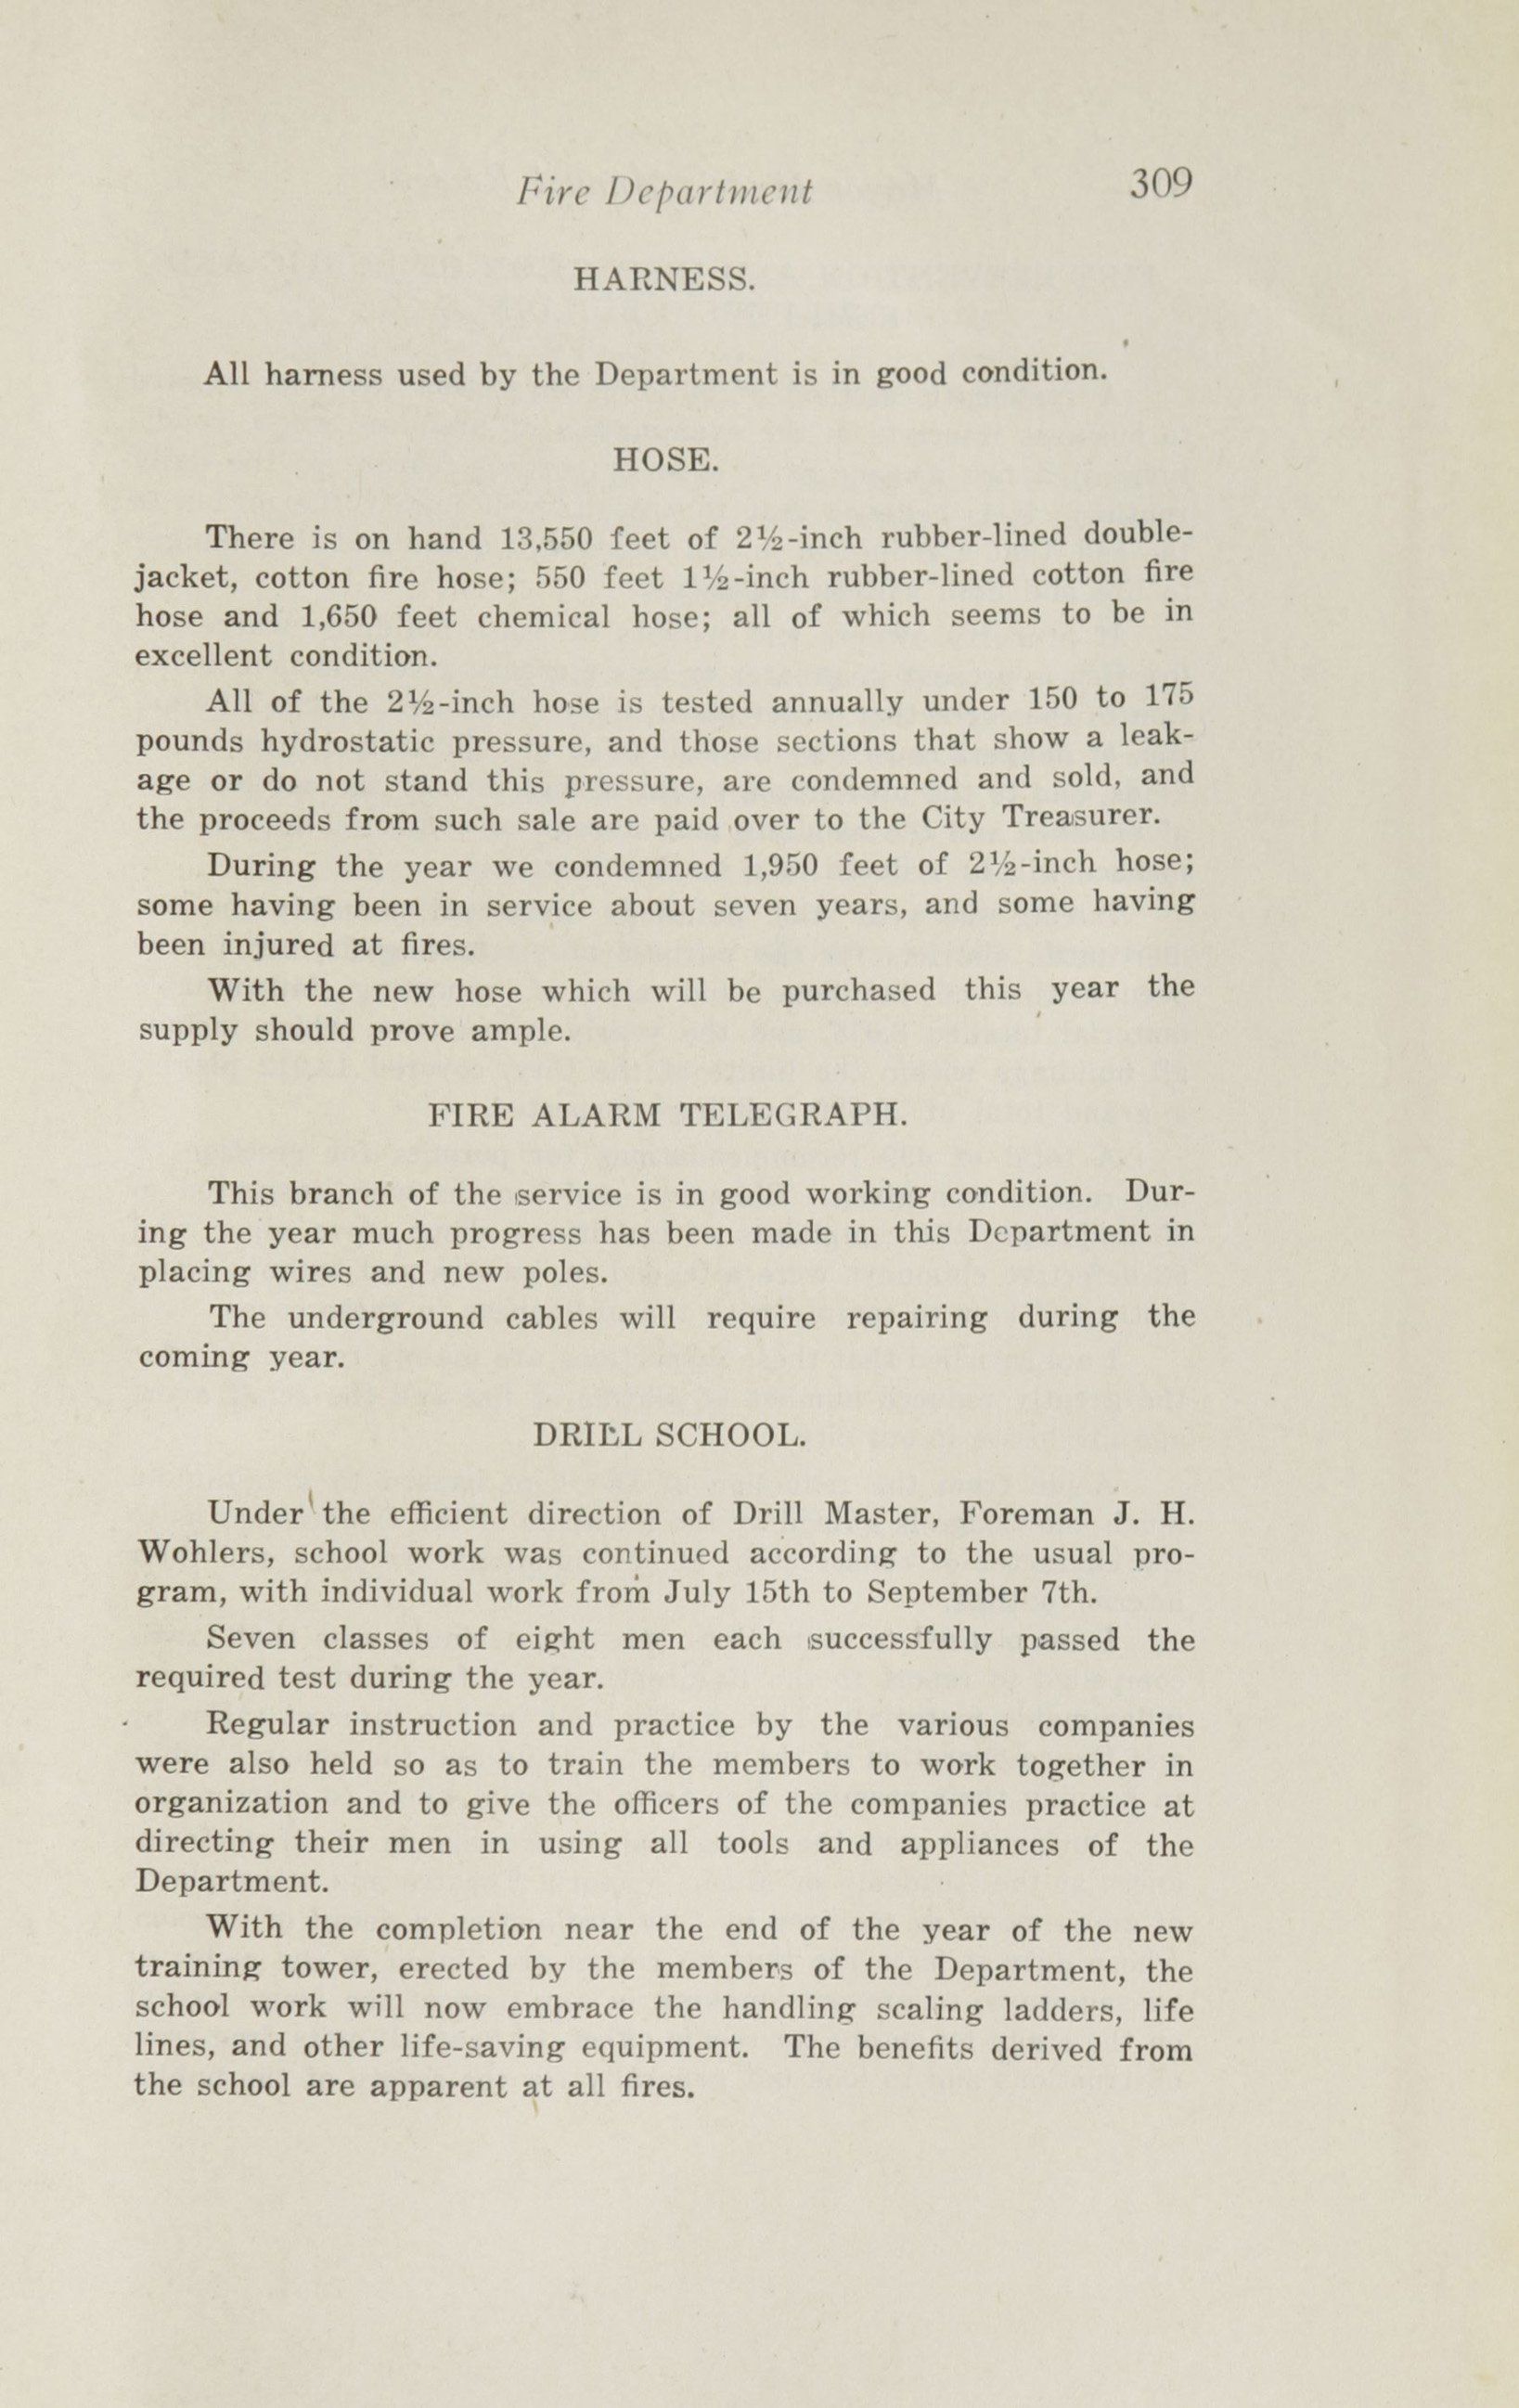 Charleston Yearbook, 1916, page 309